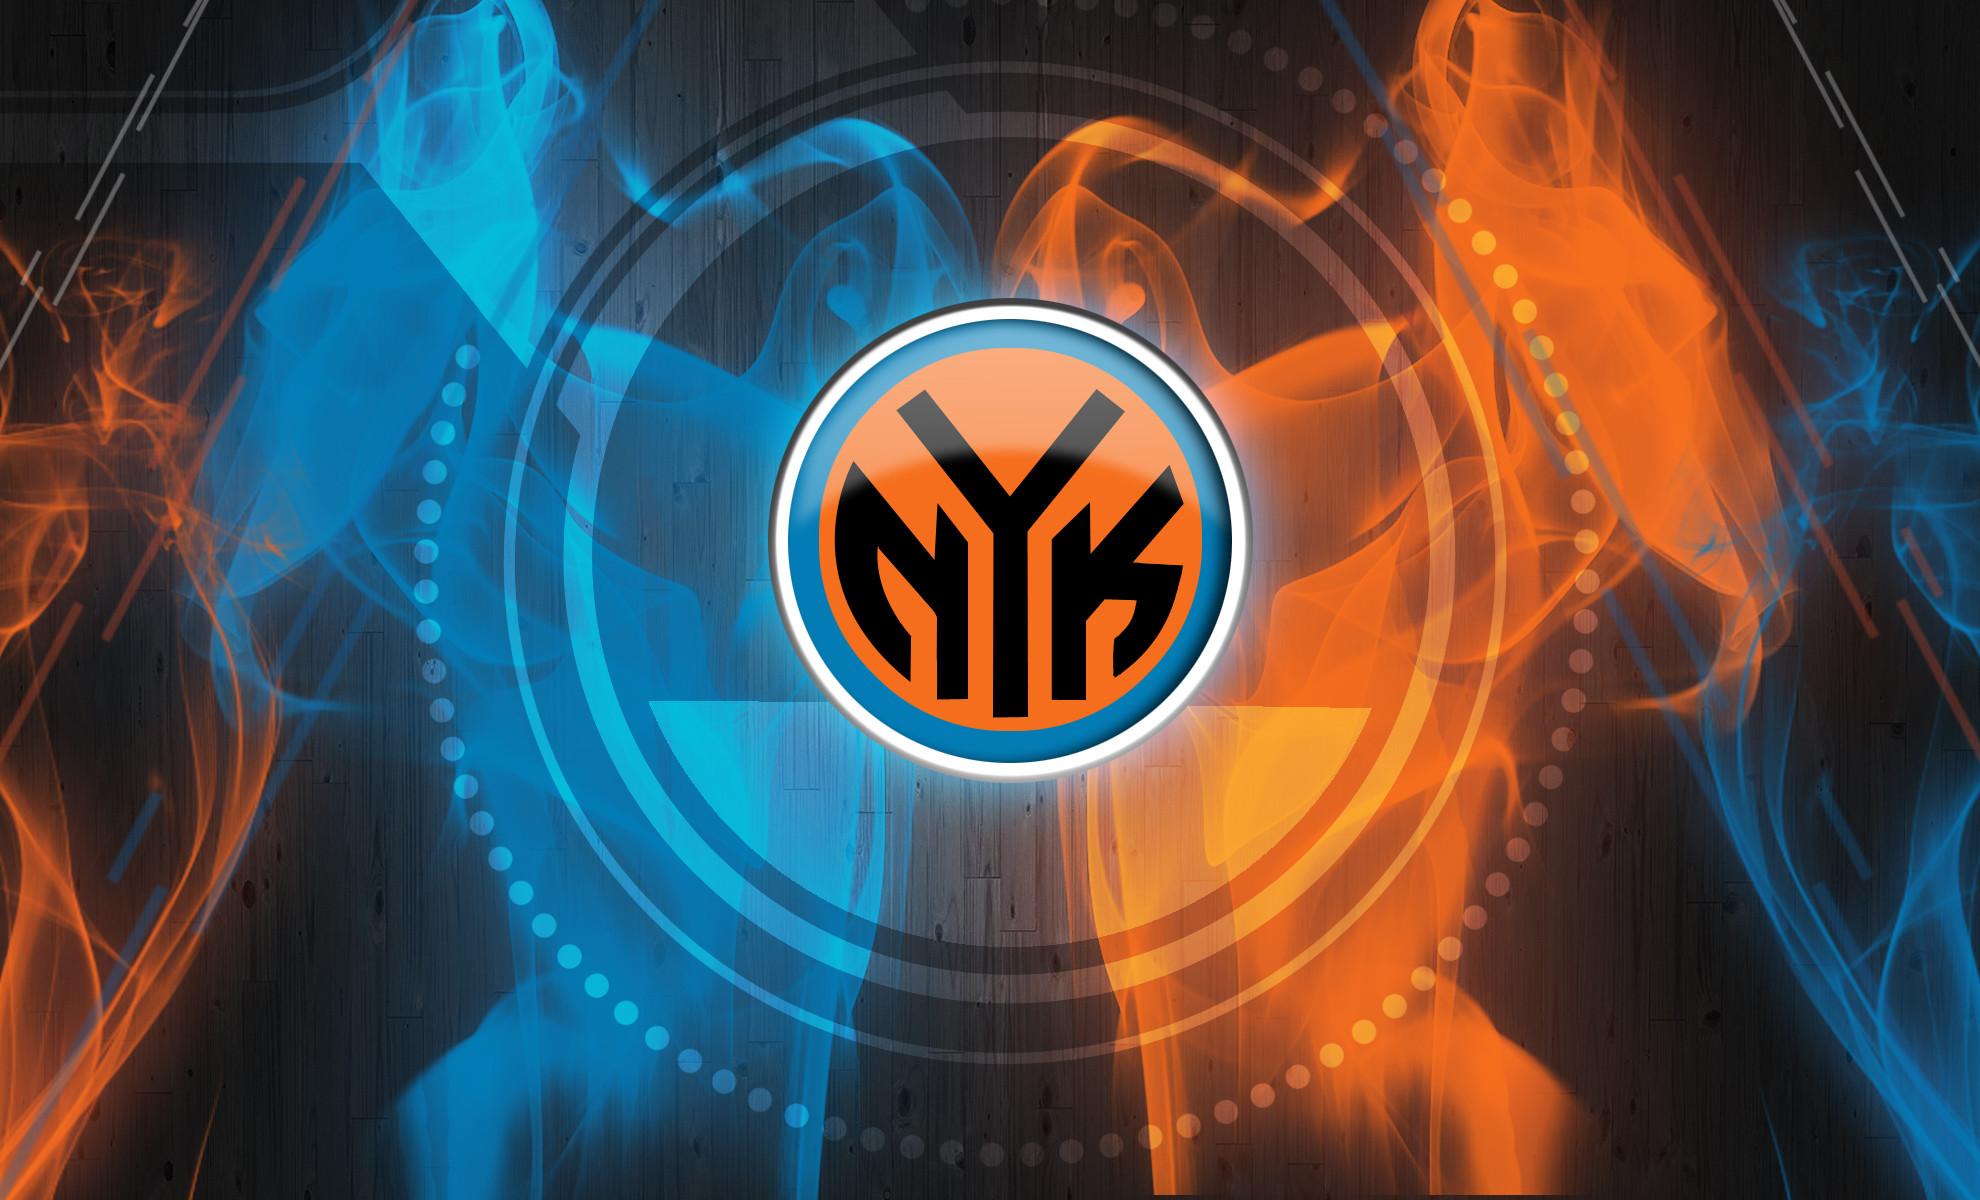 NY Knicks Wallpaper or Screensavers